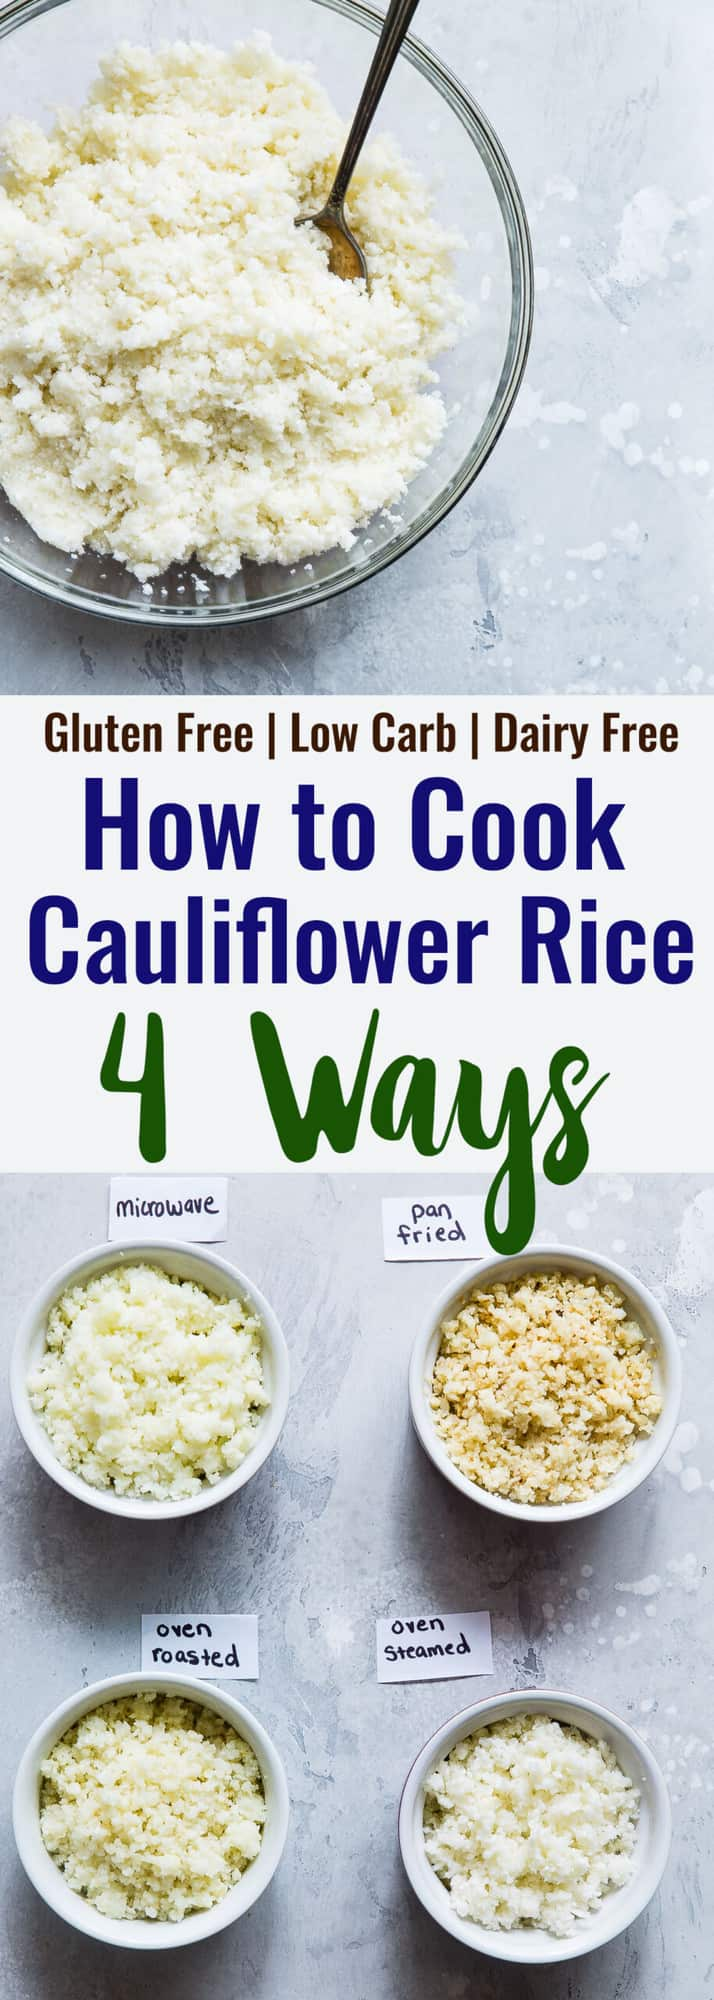 How to Cook Cauliflower Rice (9 Ways)  Food Faith Fitness